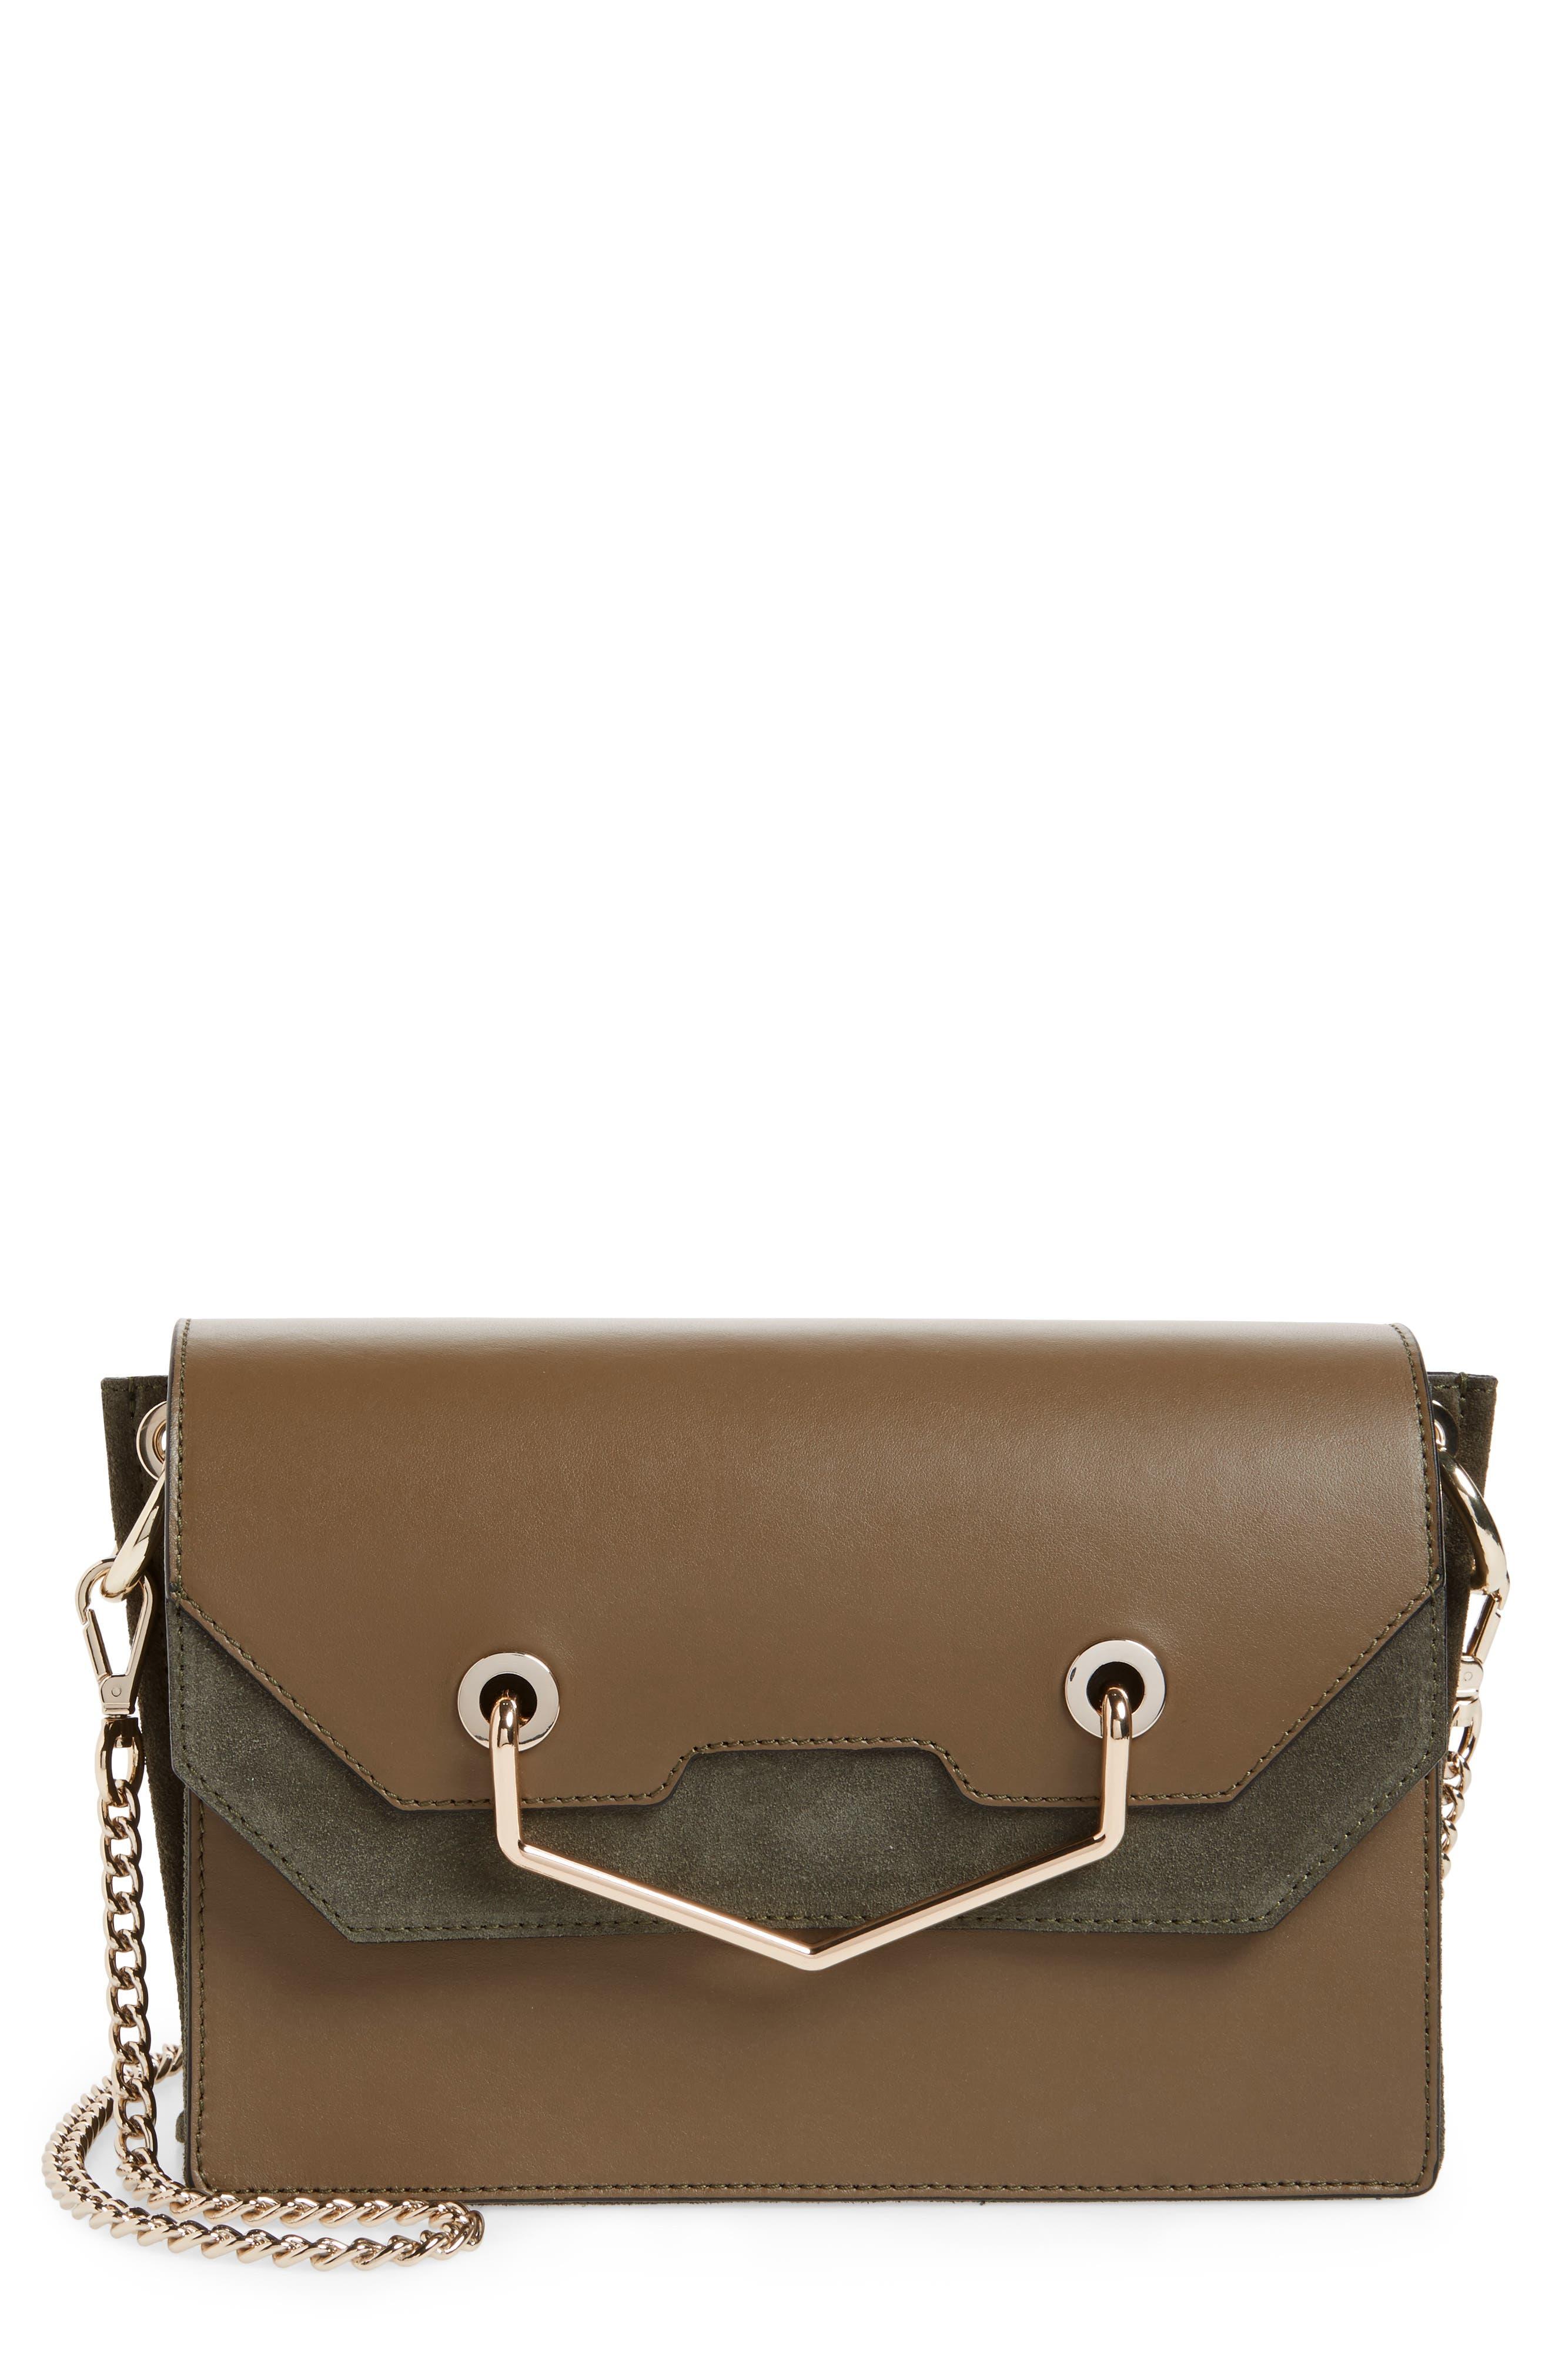 Premium Leather & Suede Soko Shoulder Bag,                         Main,                         color,